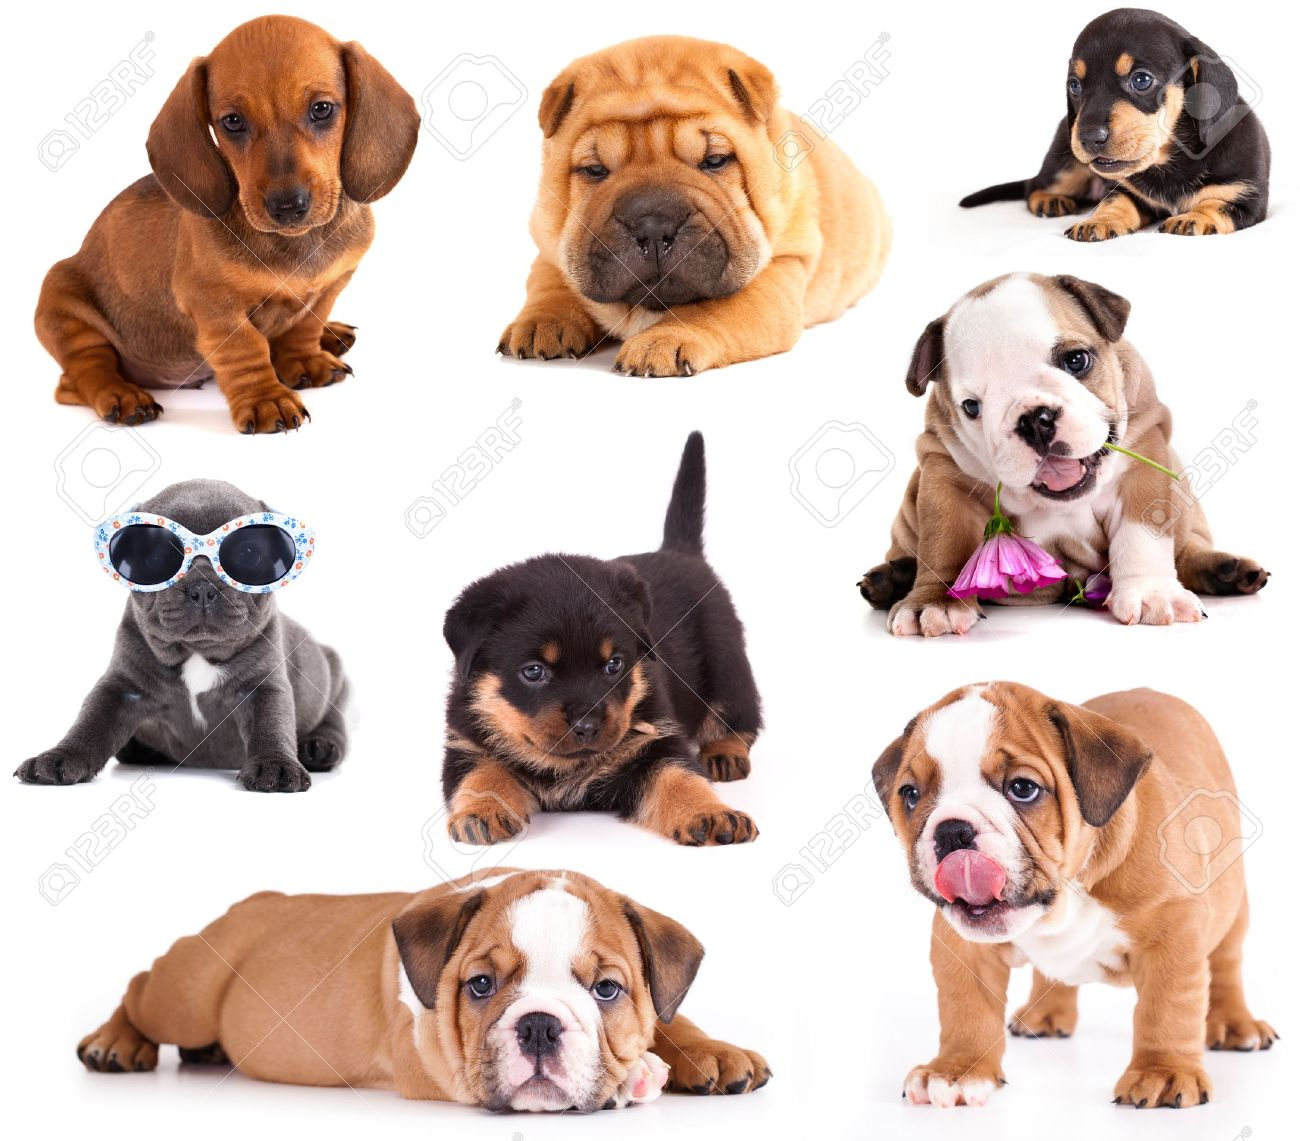 Puppies Of Different Breeds Dachshund Shar Pei Rottweiler